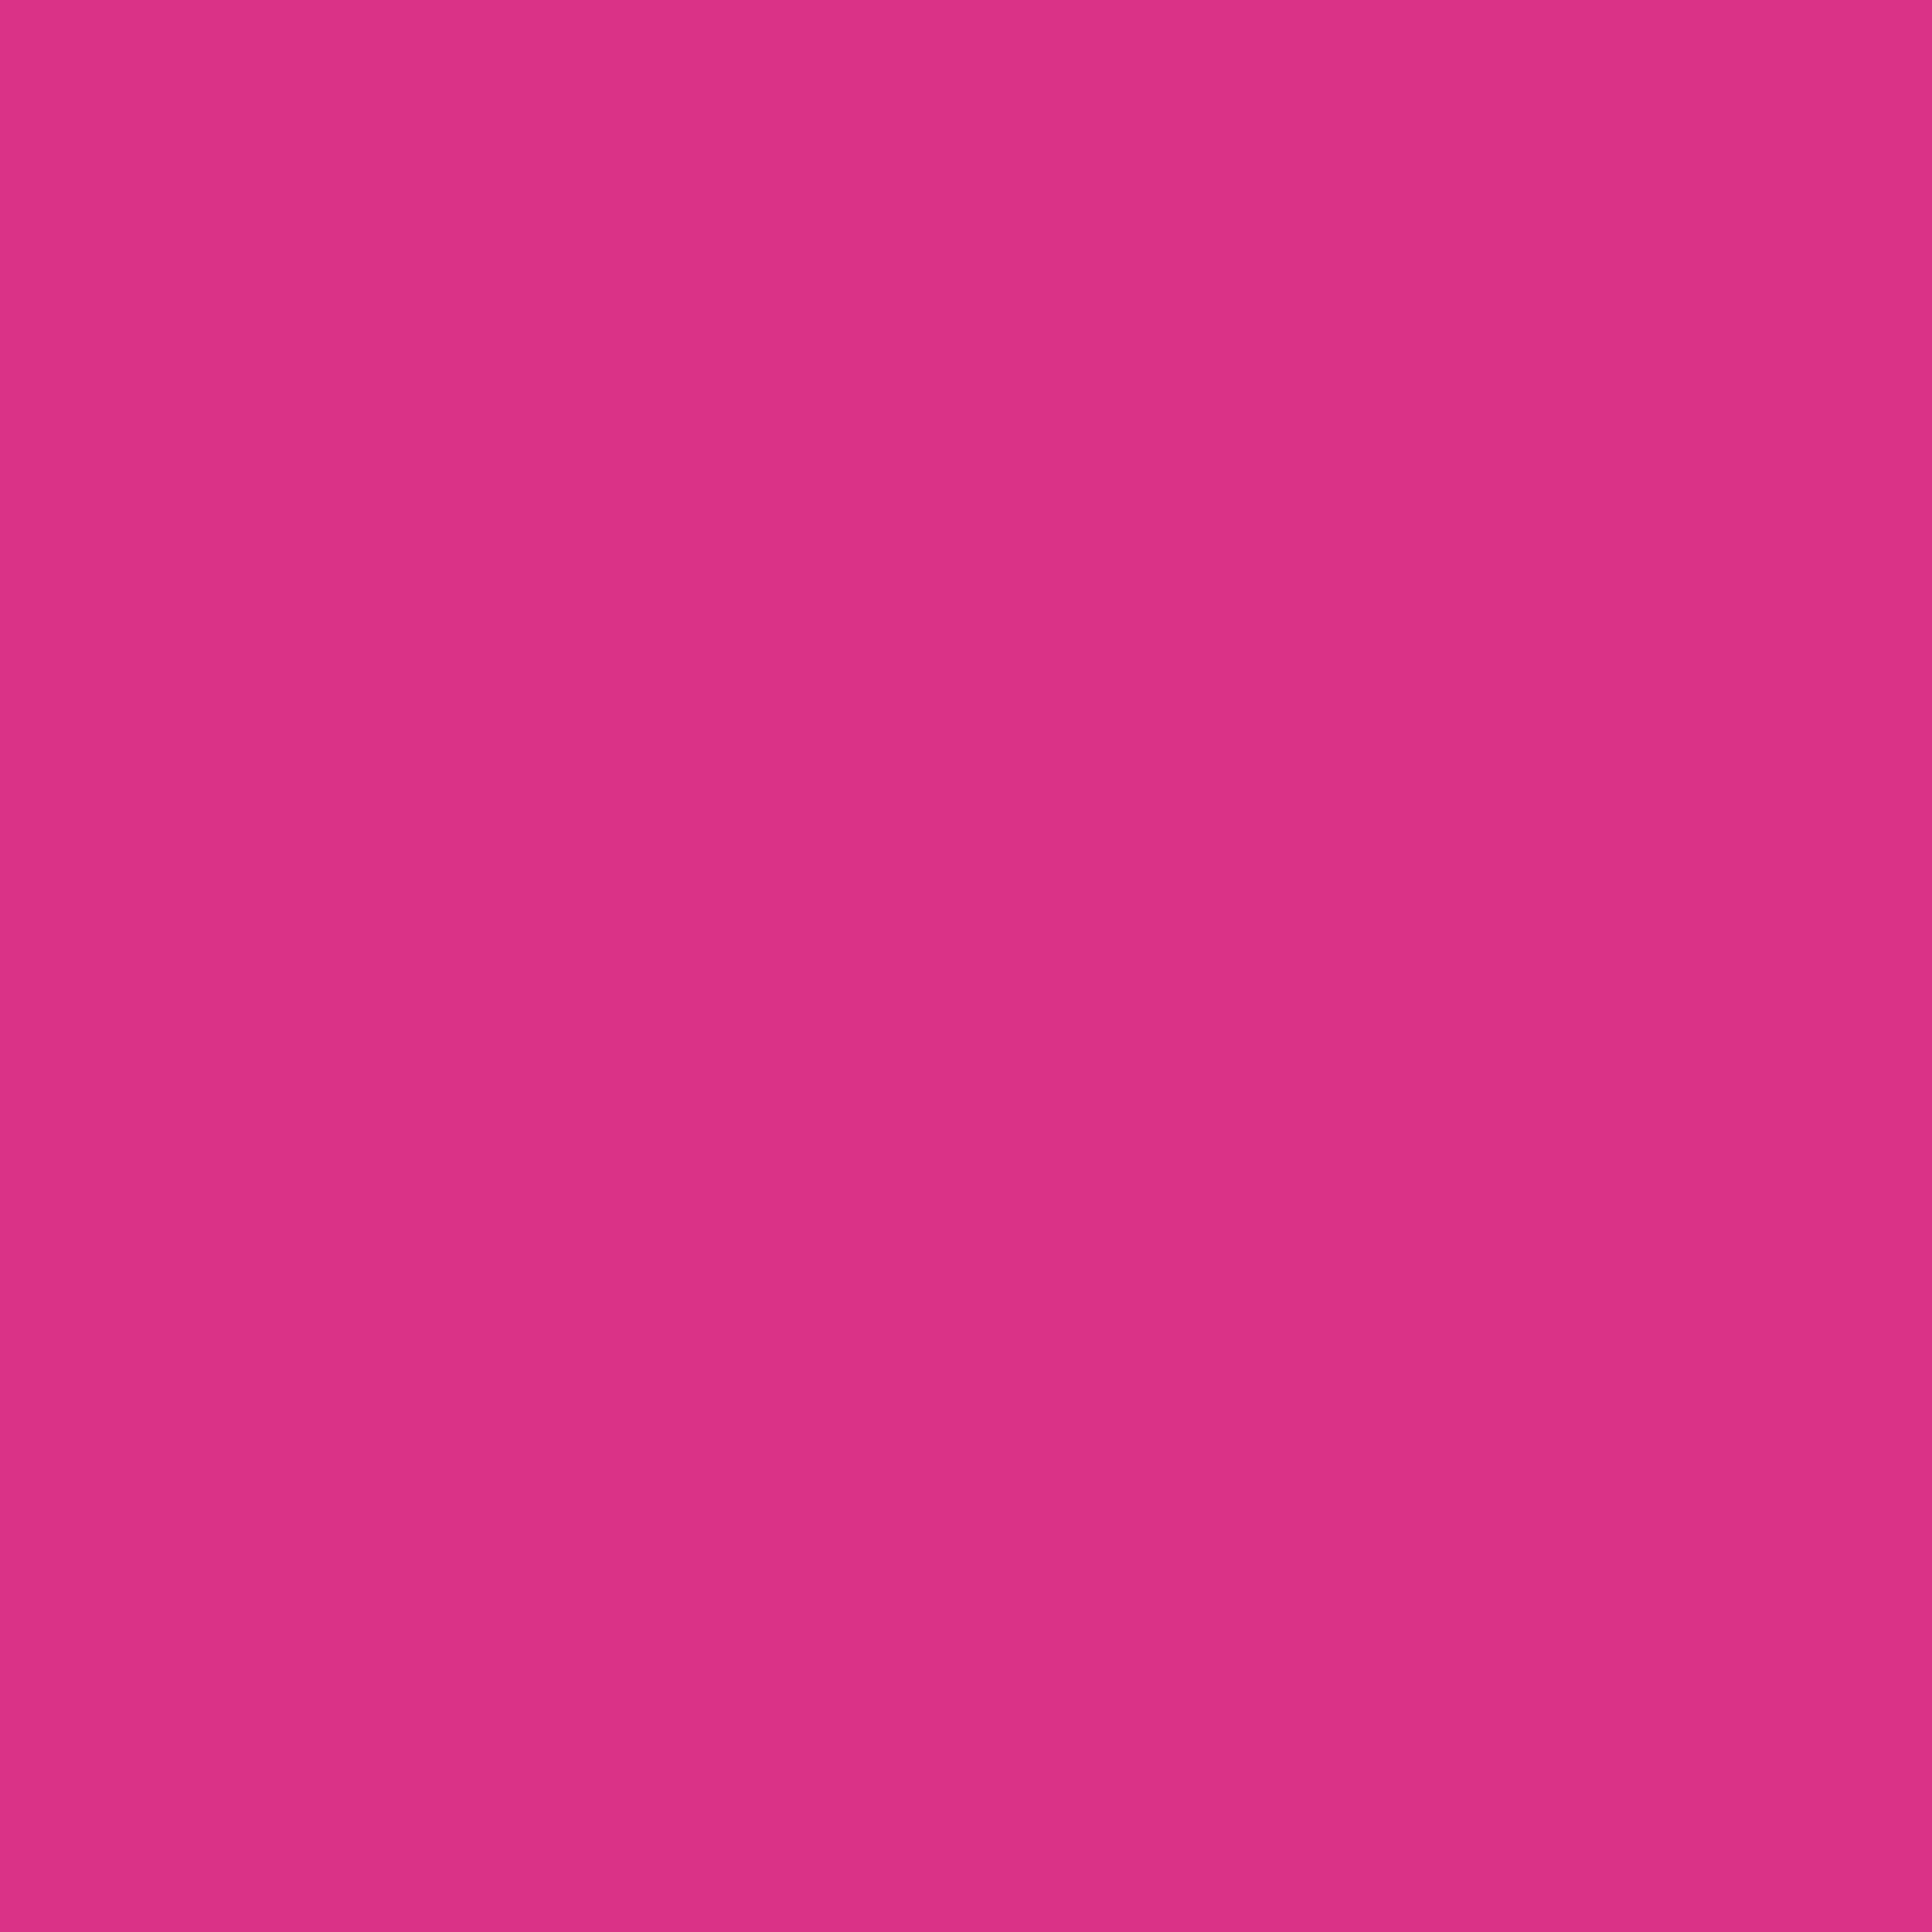 2048x2048 Deep Cerise Solid Color Background